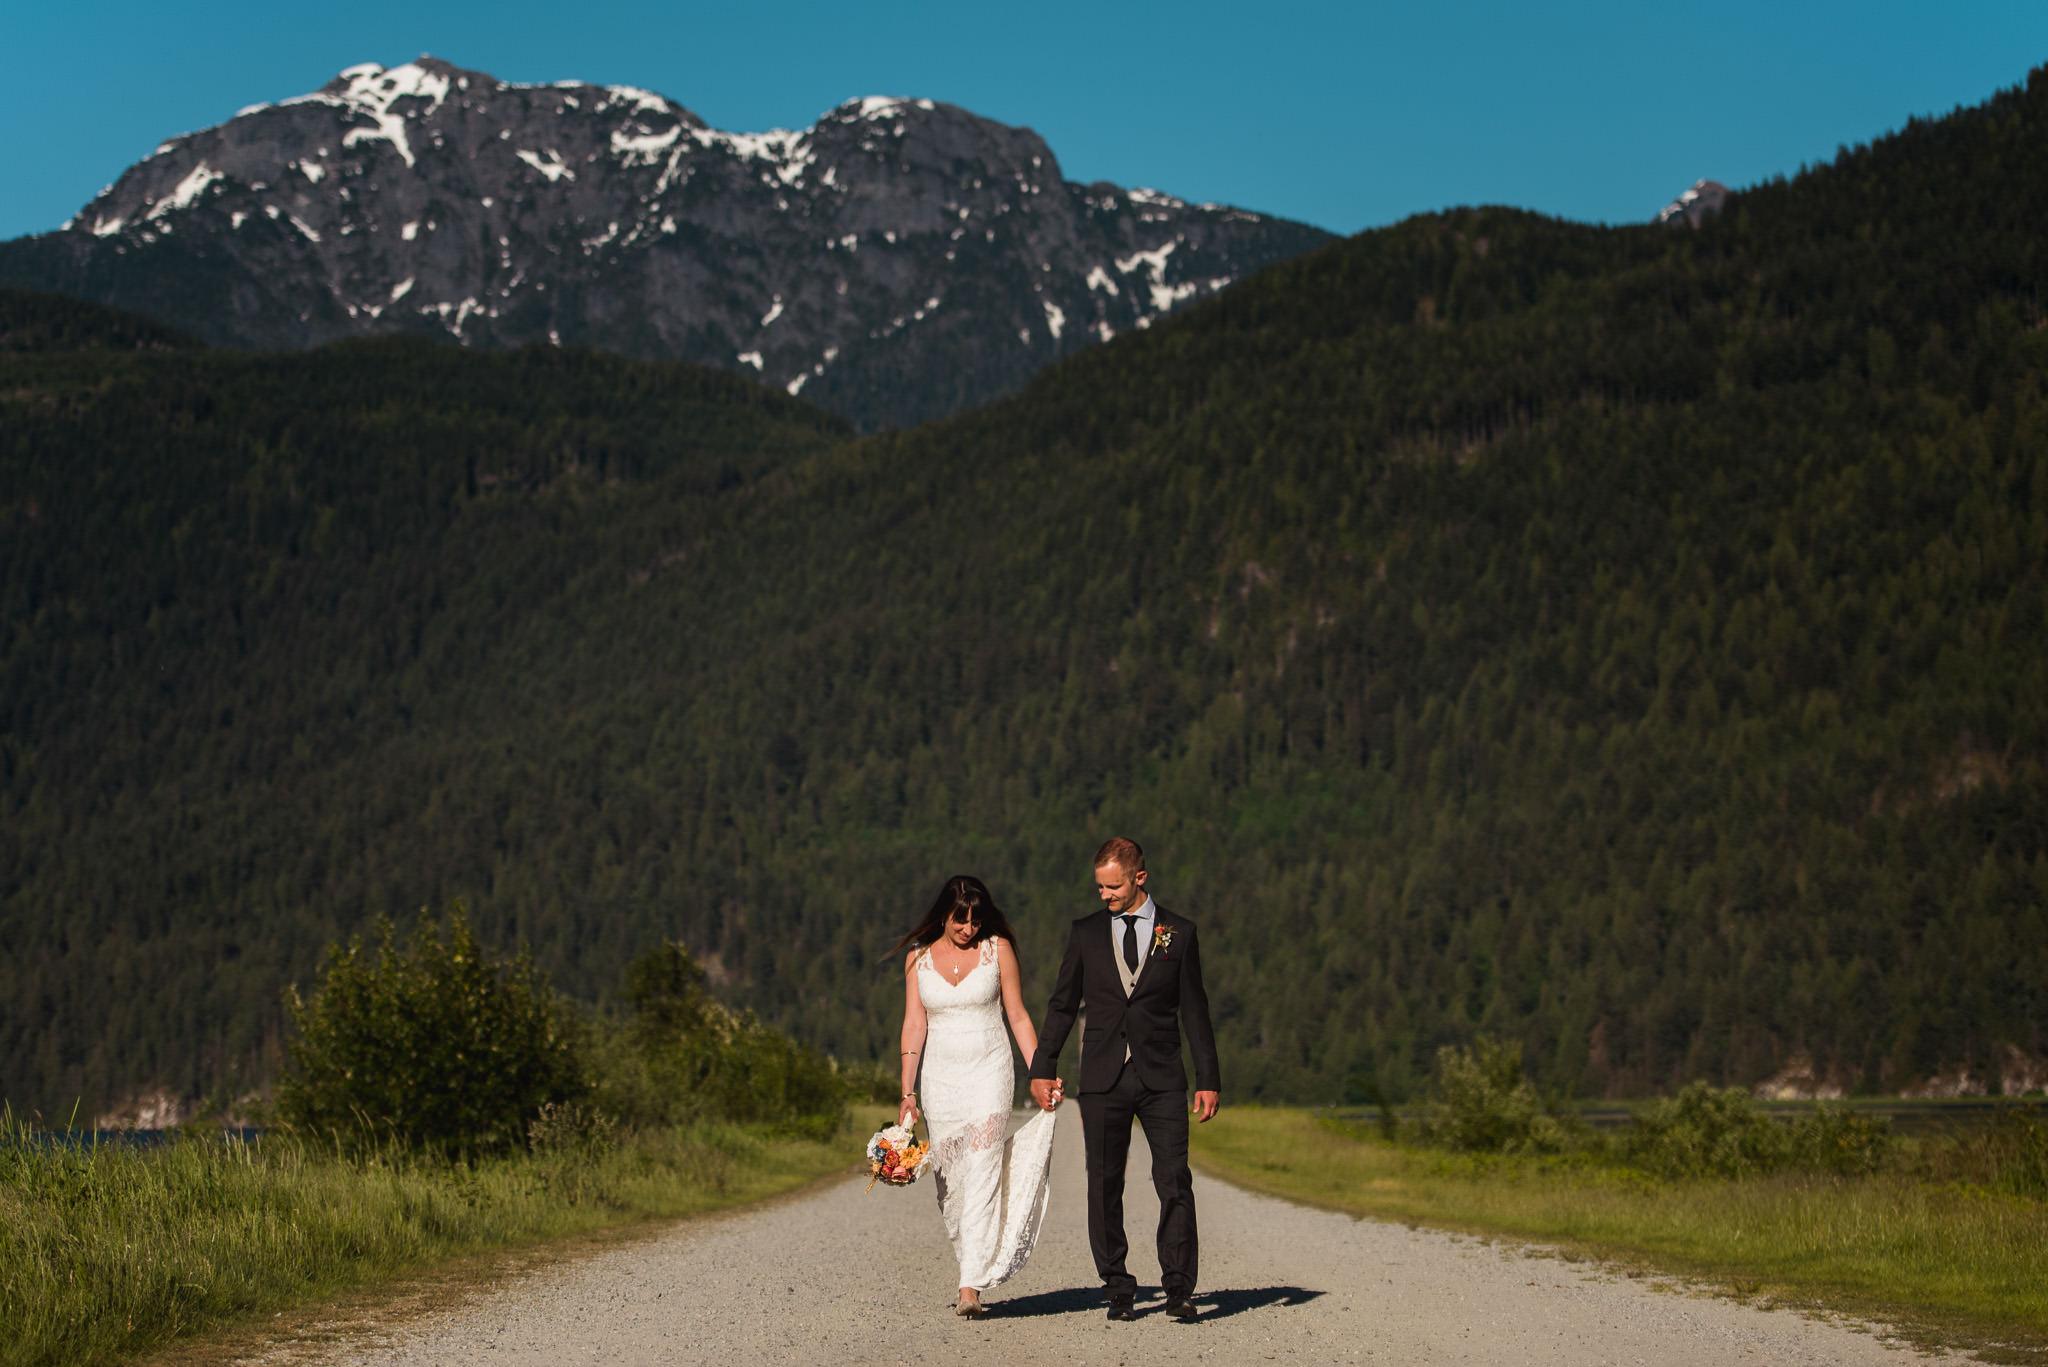 Melanie-Matt-Pitt-Lake-Post-Wedding-Shoot-Victoria-Wedding-Photographers-7.jpg